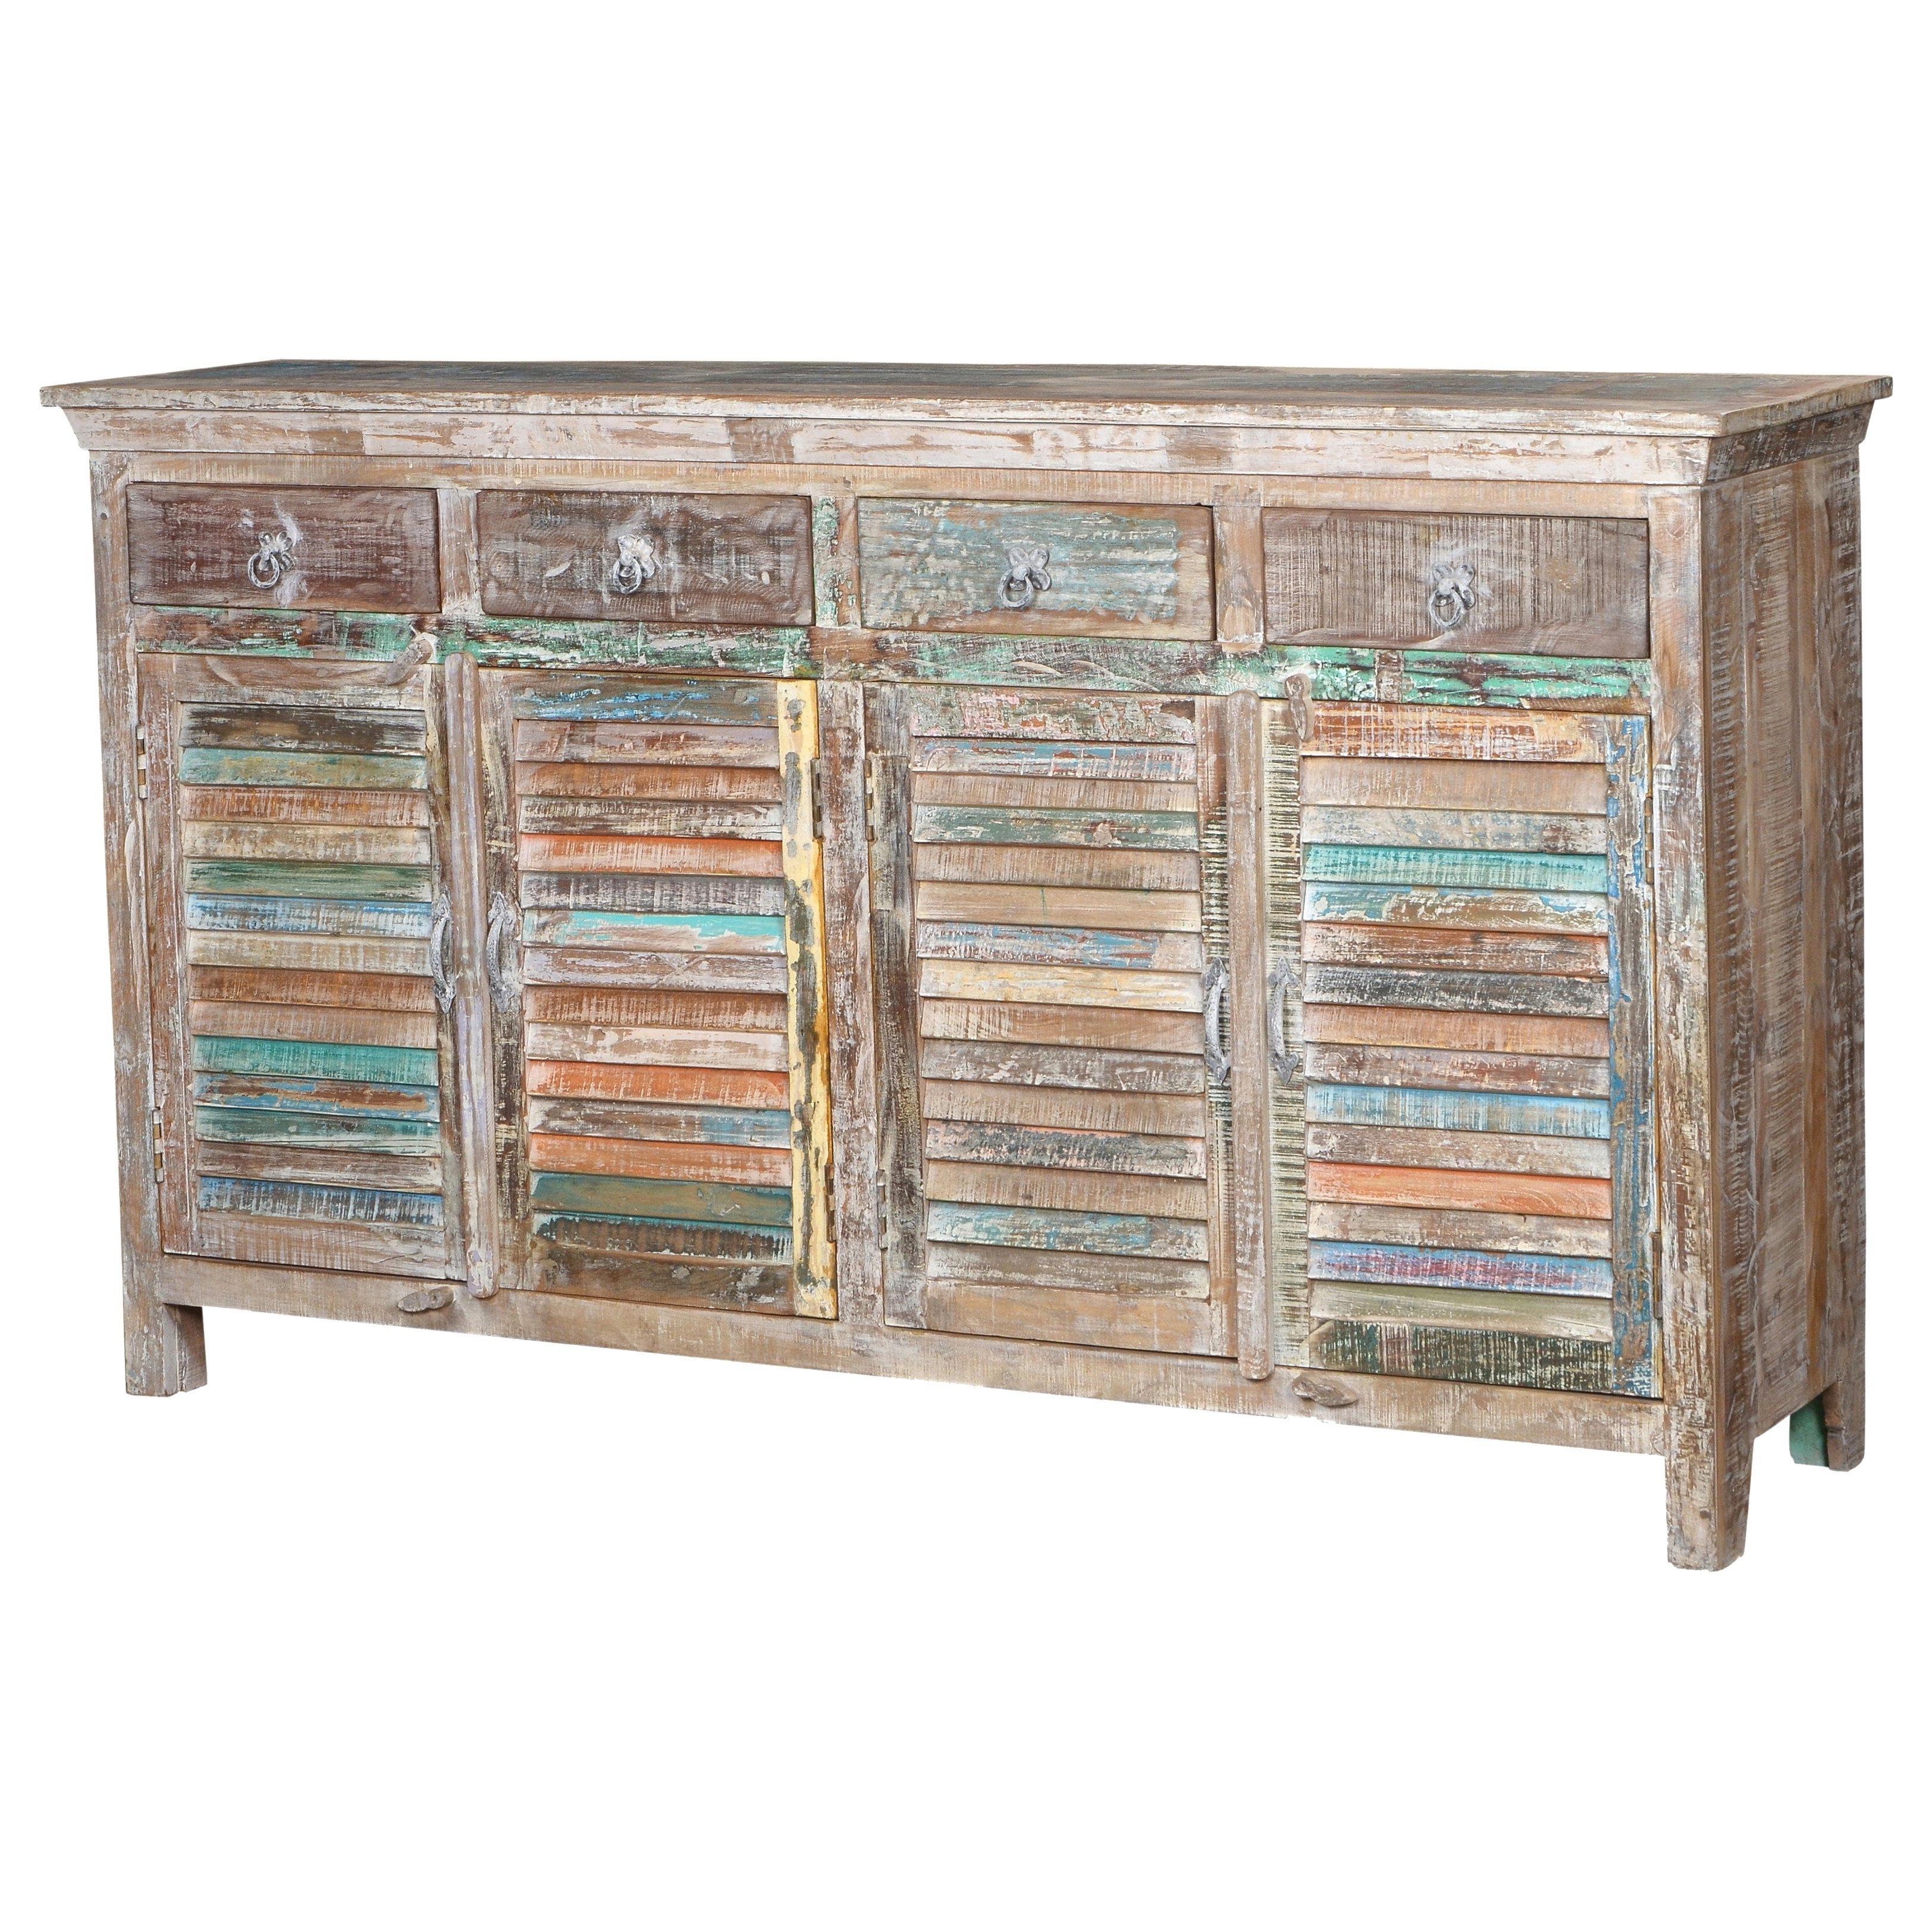 "Shop Aiden 4 Drawer 4 Door Shutter Sideboard 72"" Lime – Free Inside Newest Reclaimed Pine Turquoise 4 Door Sideboards (View 7 of 20)"